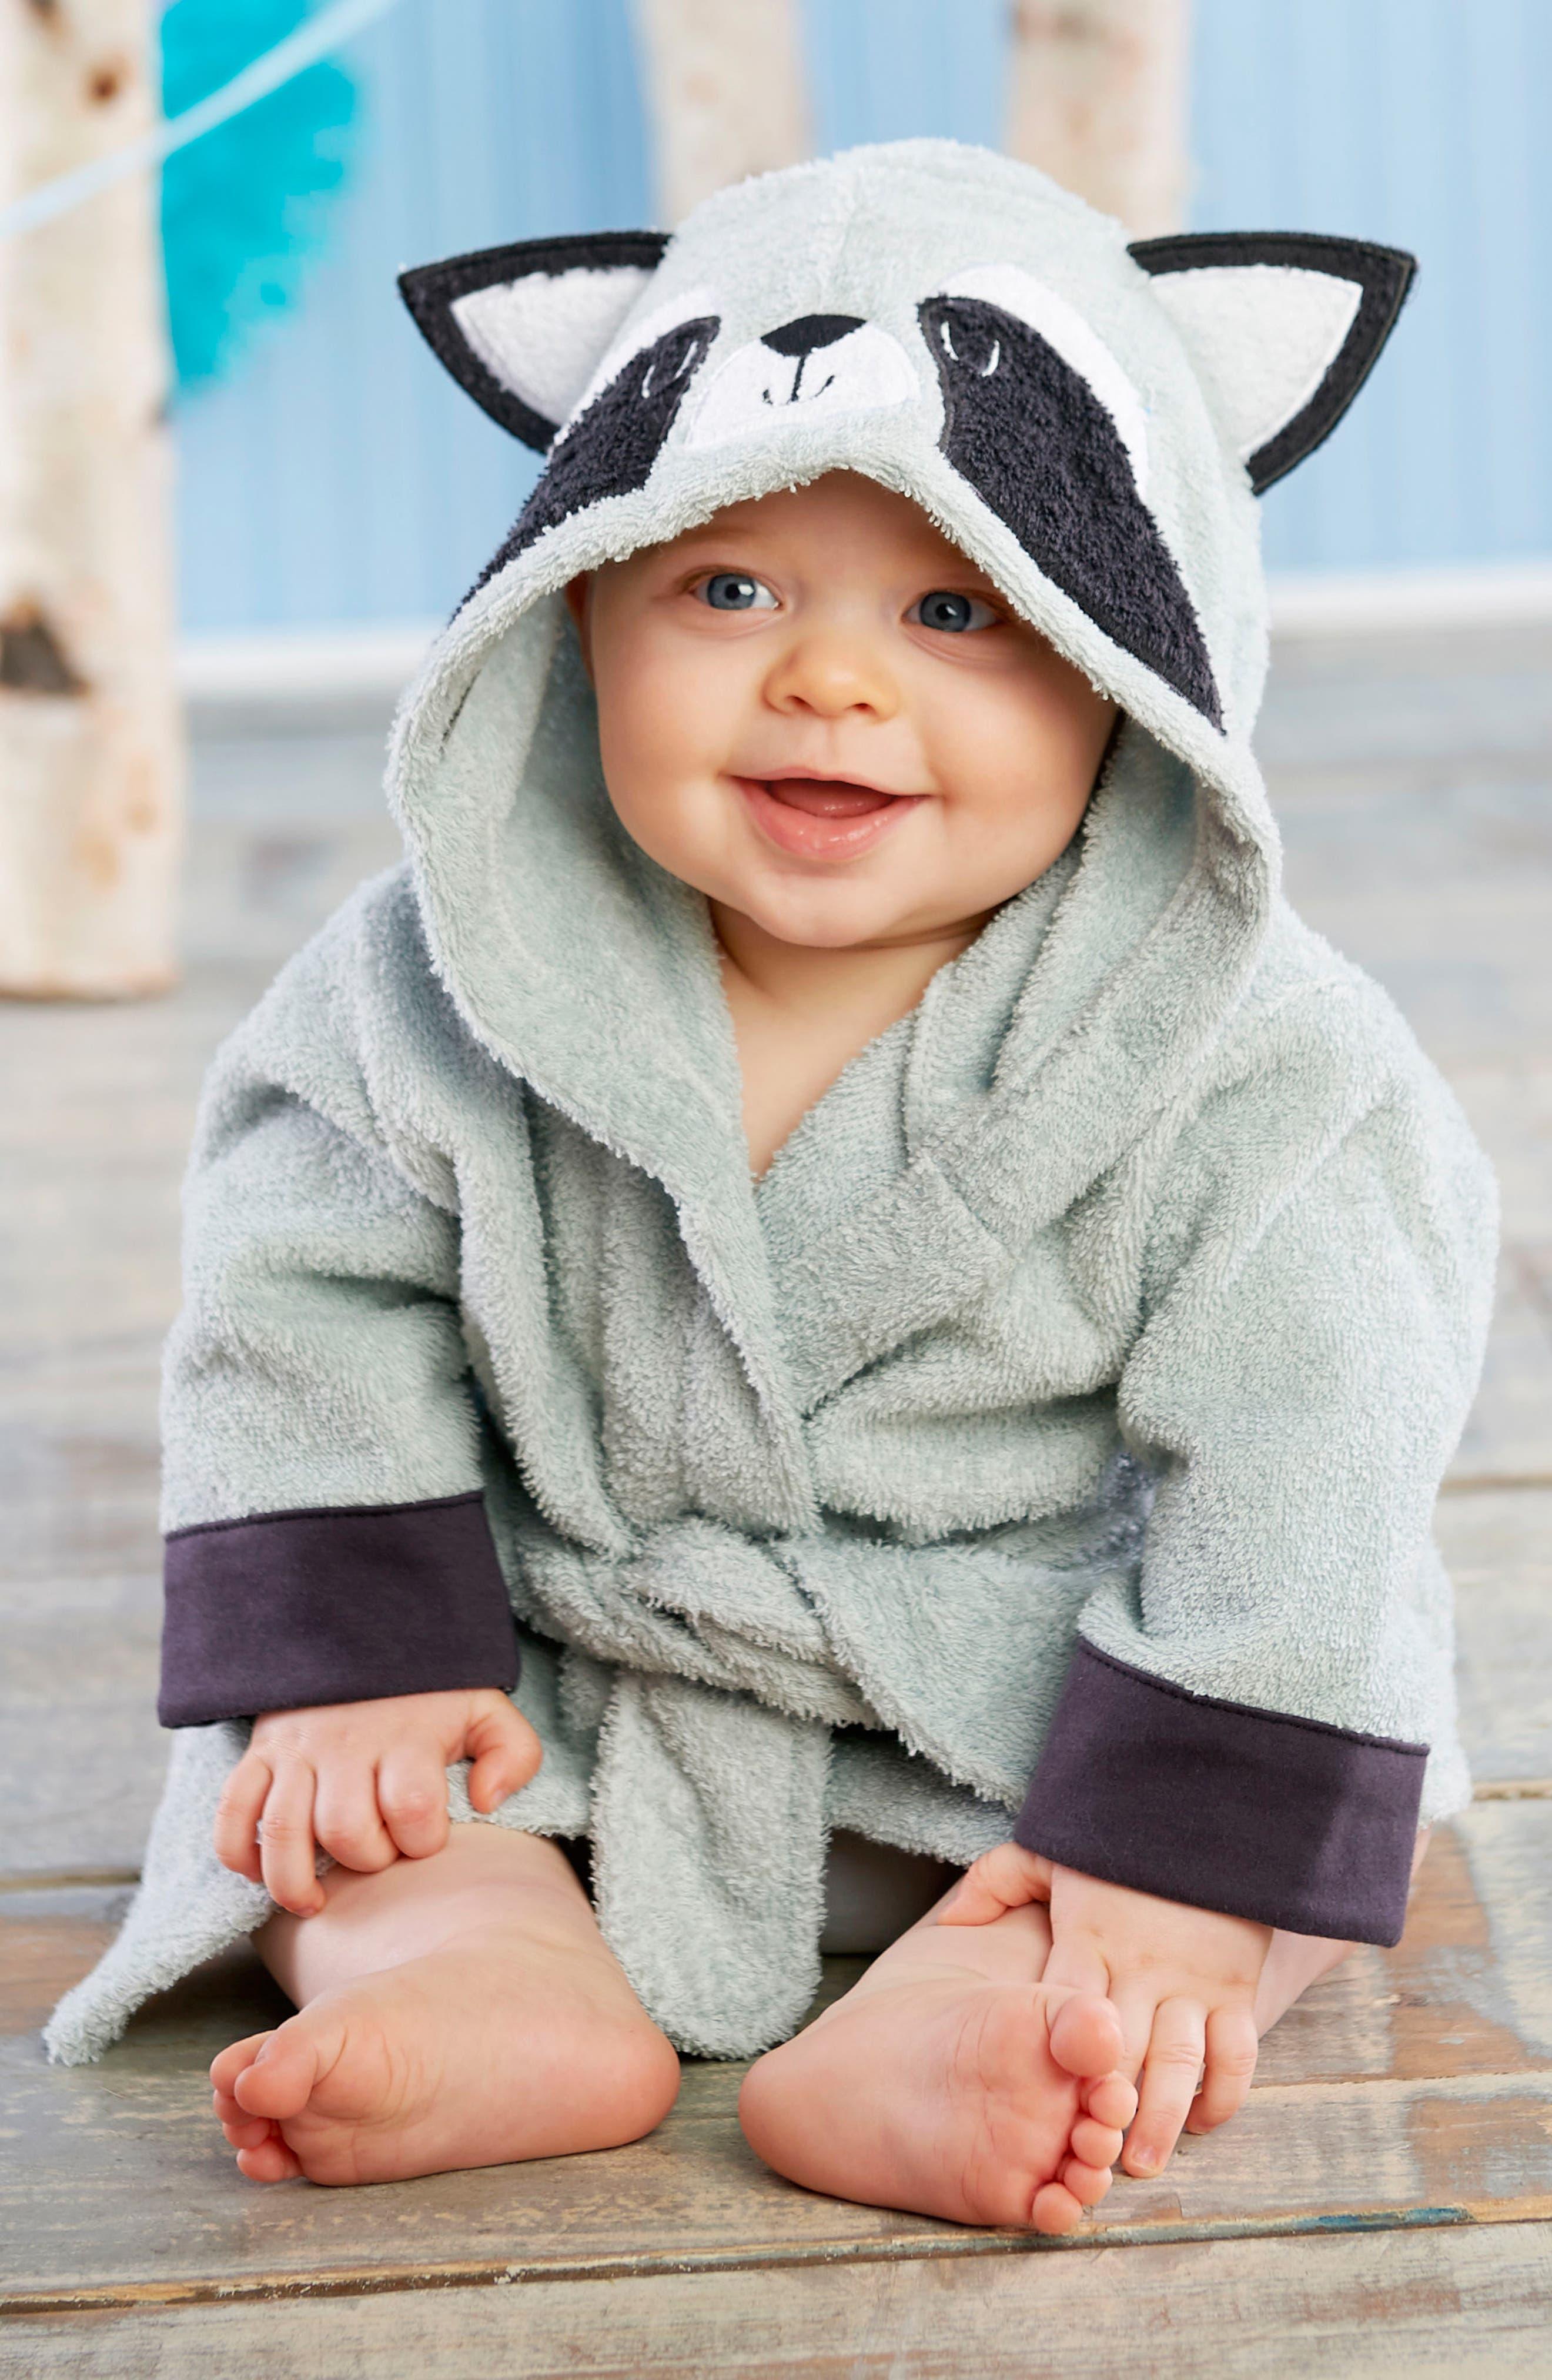 Alternate Image 3  - Baby Aspen Forest Friends Raccoon Plush Robe, Fuzzy Socks, Stuffed Animal & Rattle Set (Baby)